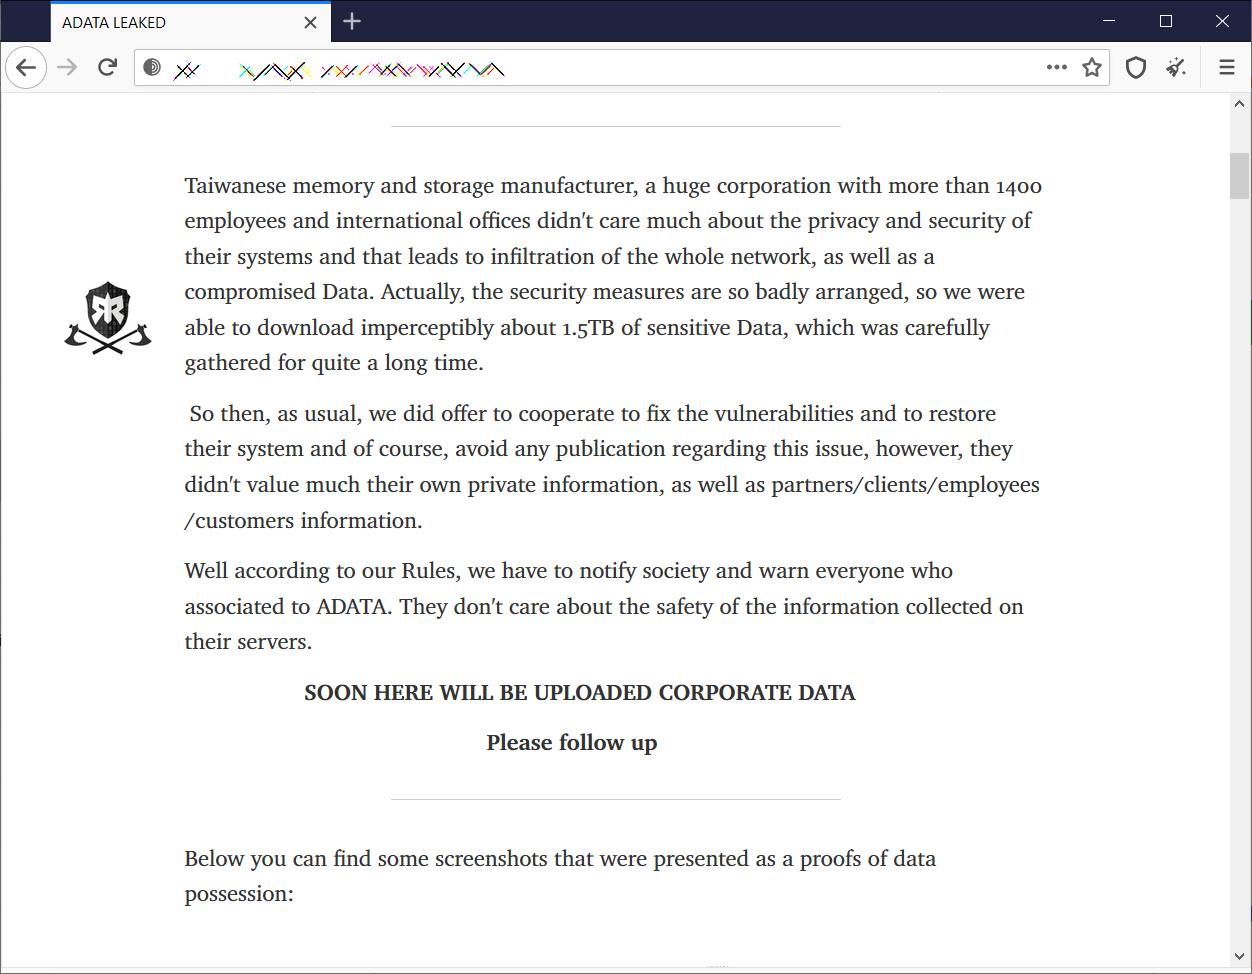 ADATA leak page